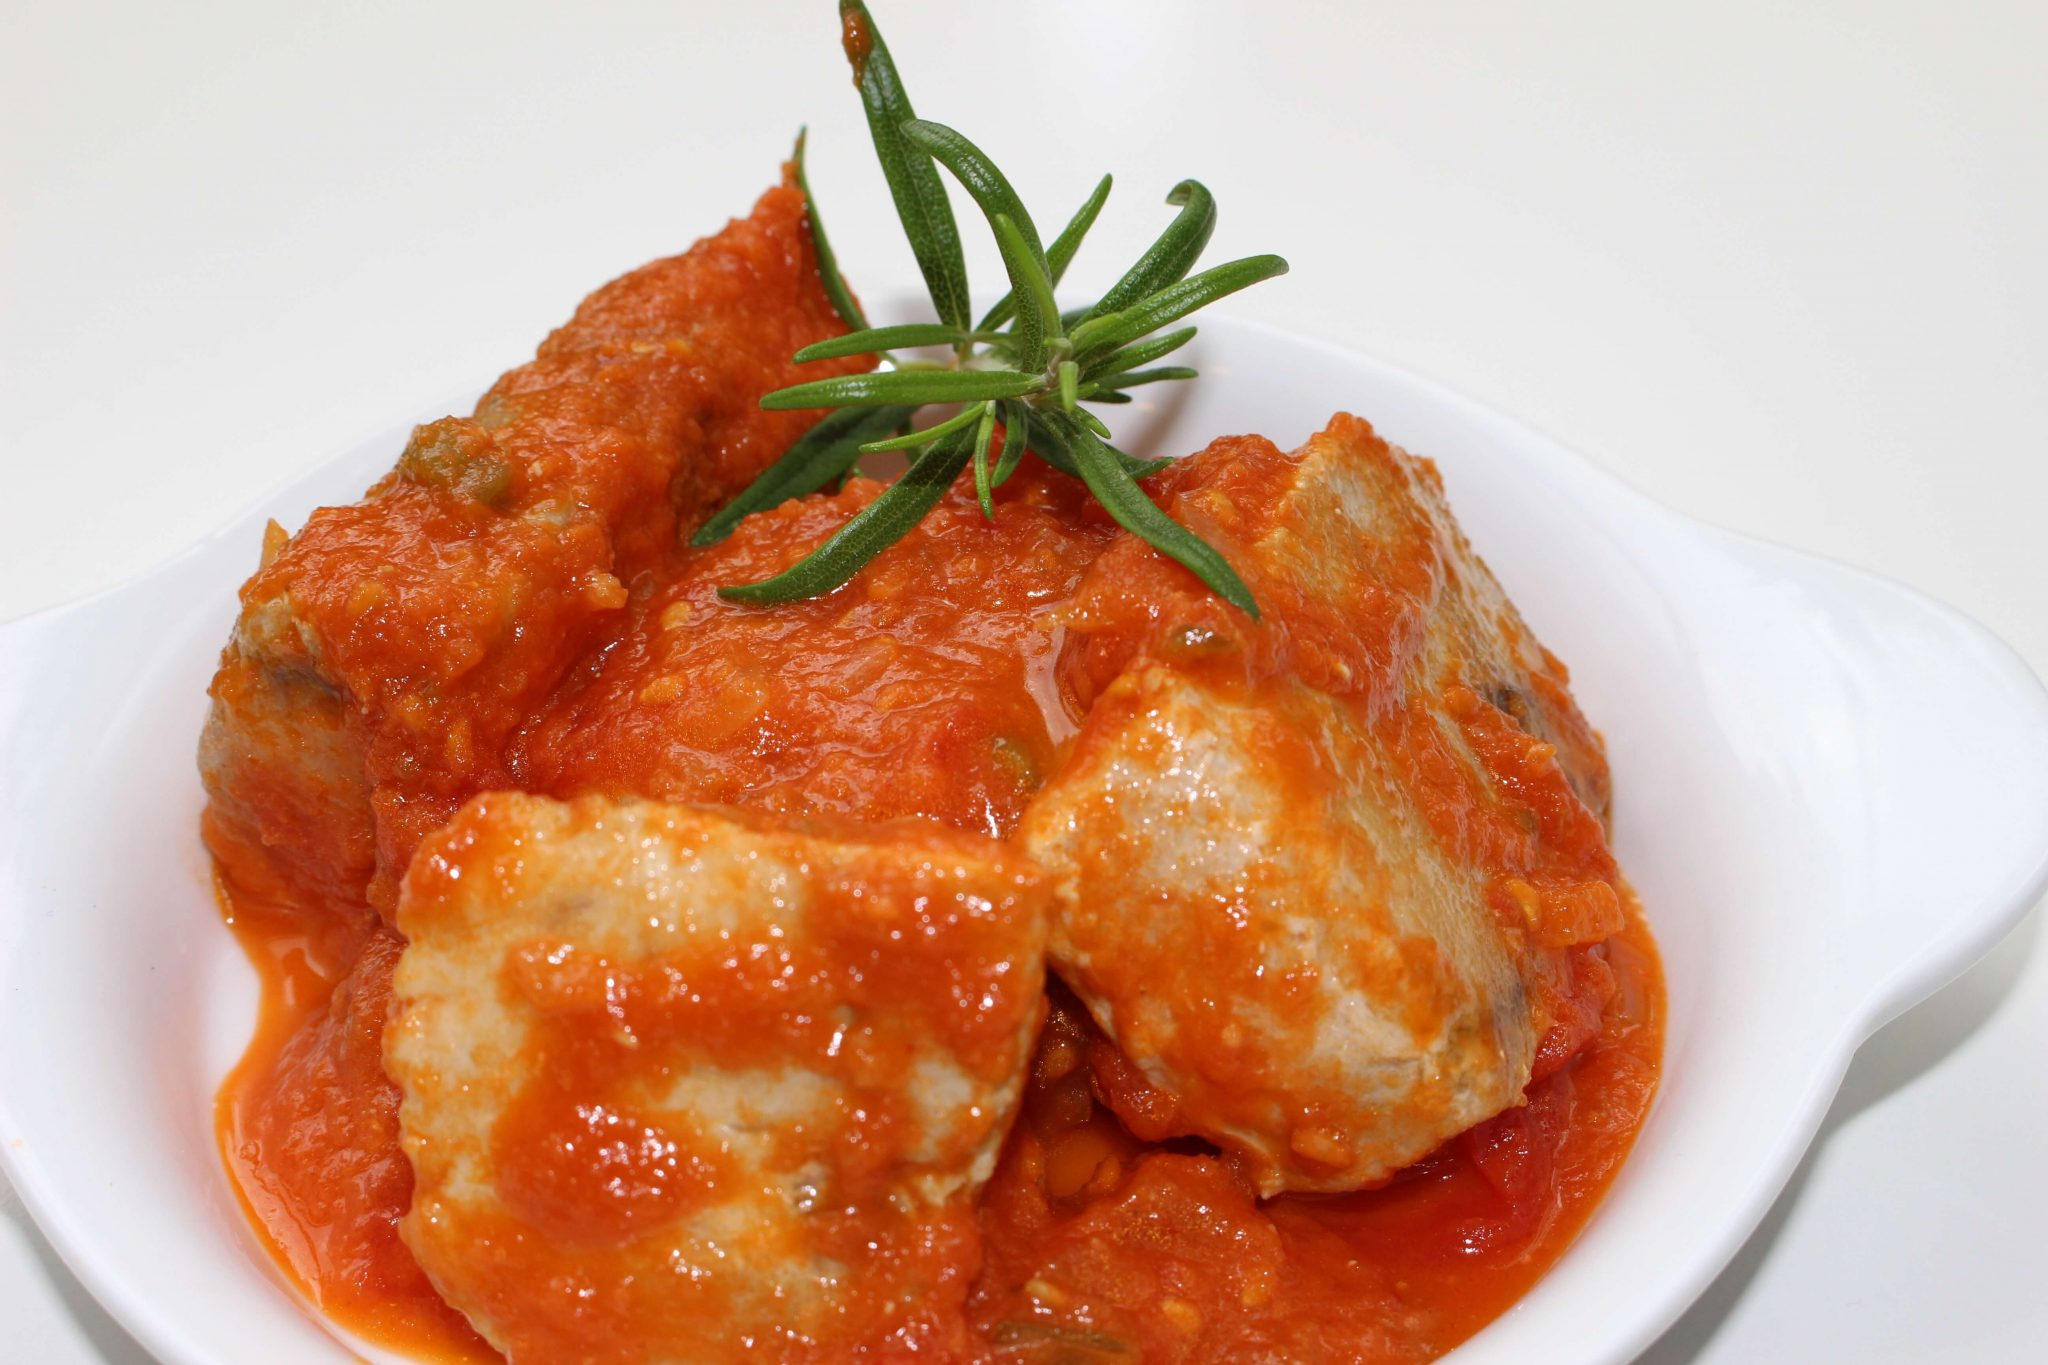 Bonito con tomate Escuela de Cocina TELVA